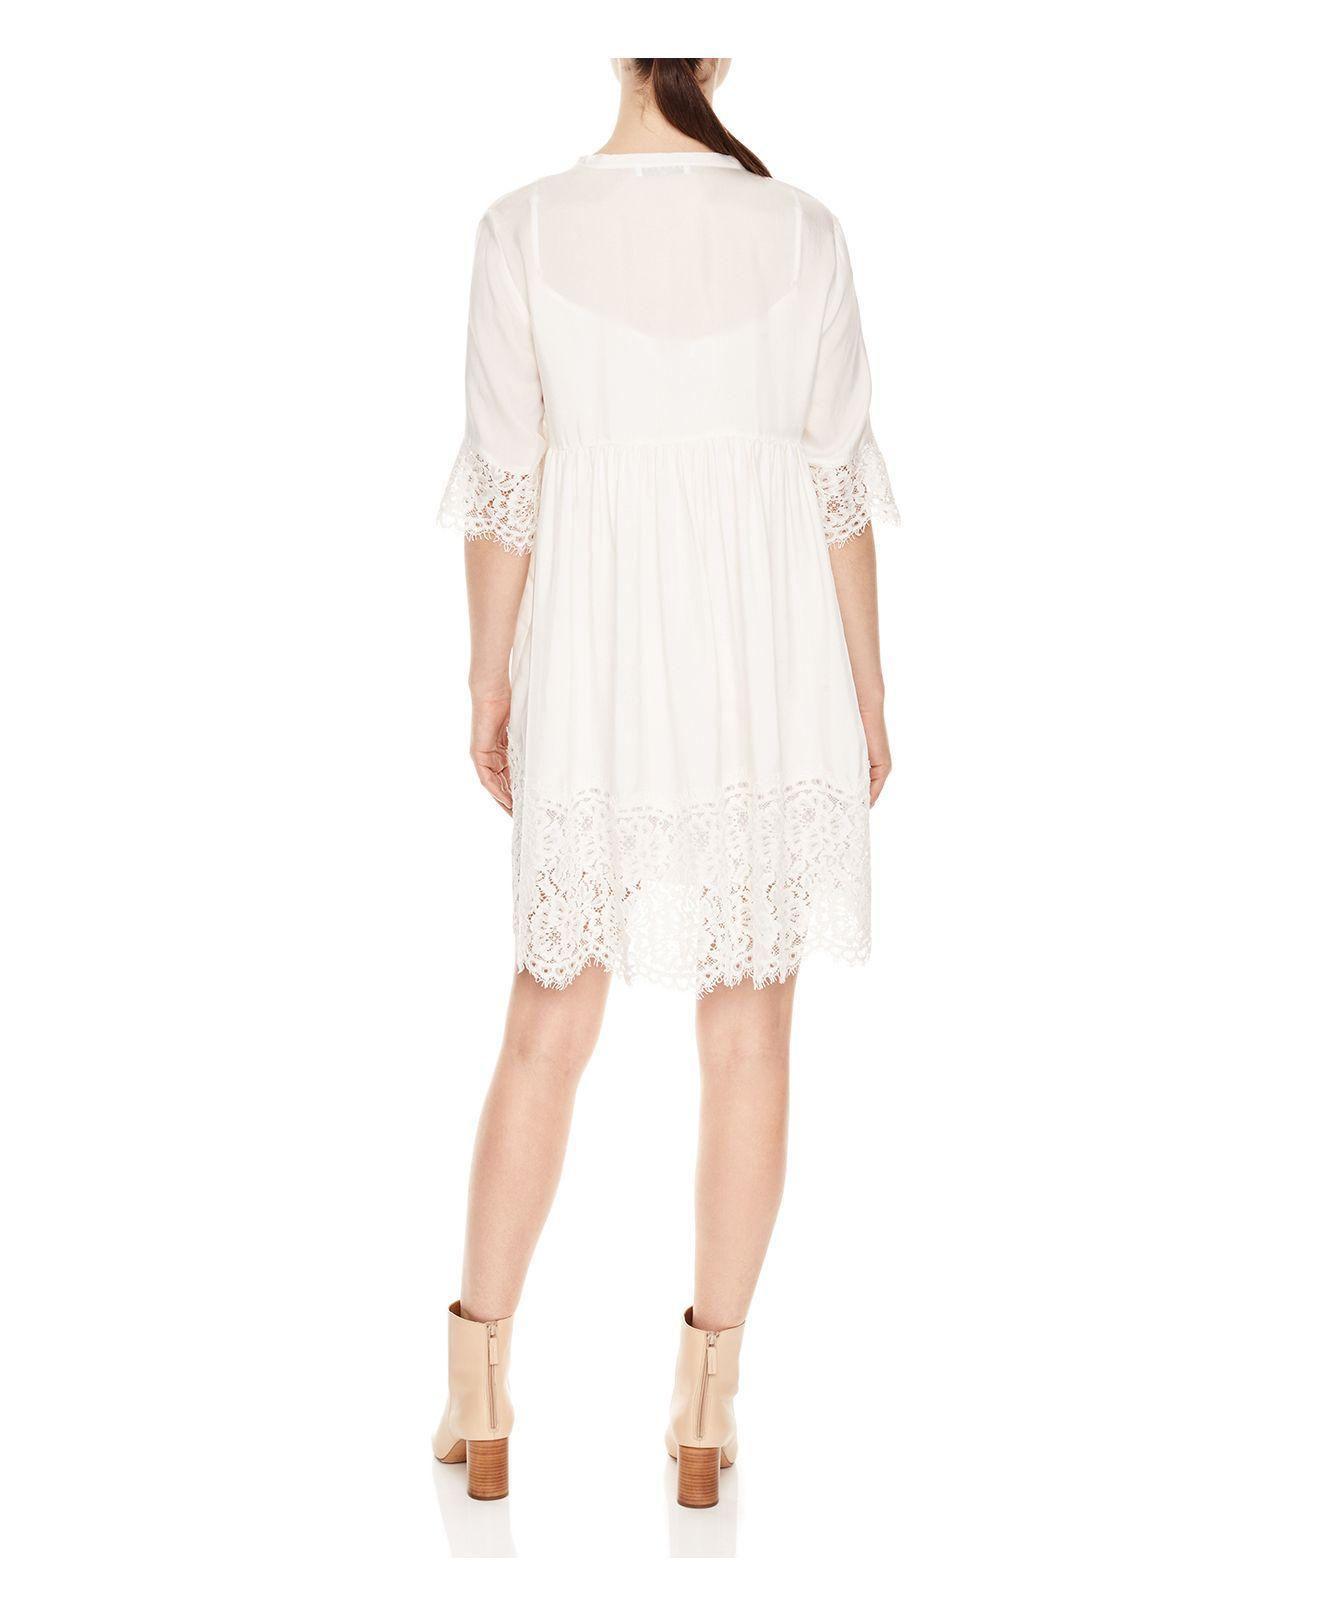 Sandro Rosalie Lace Trim Dress In White Lyst